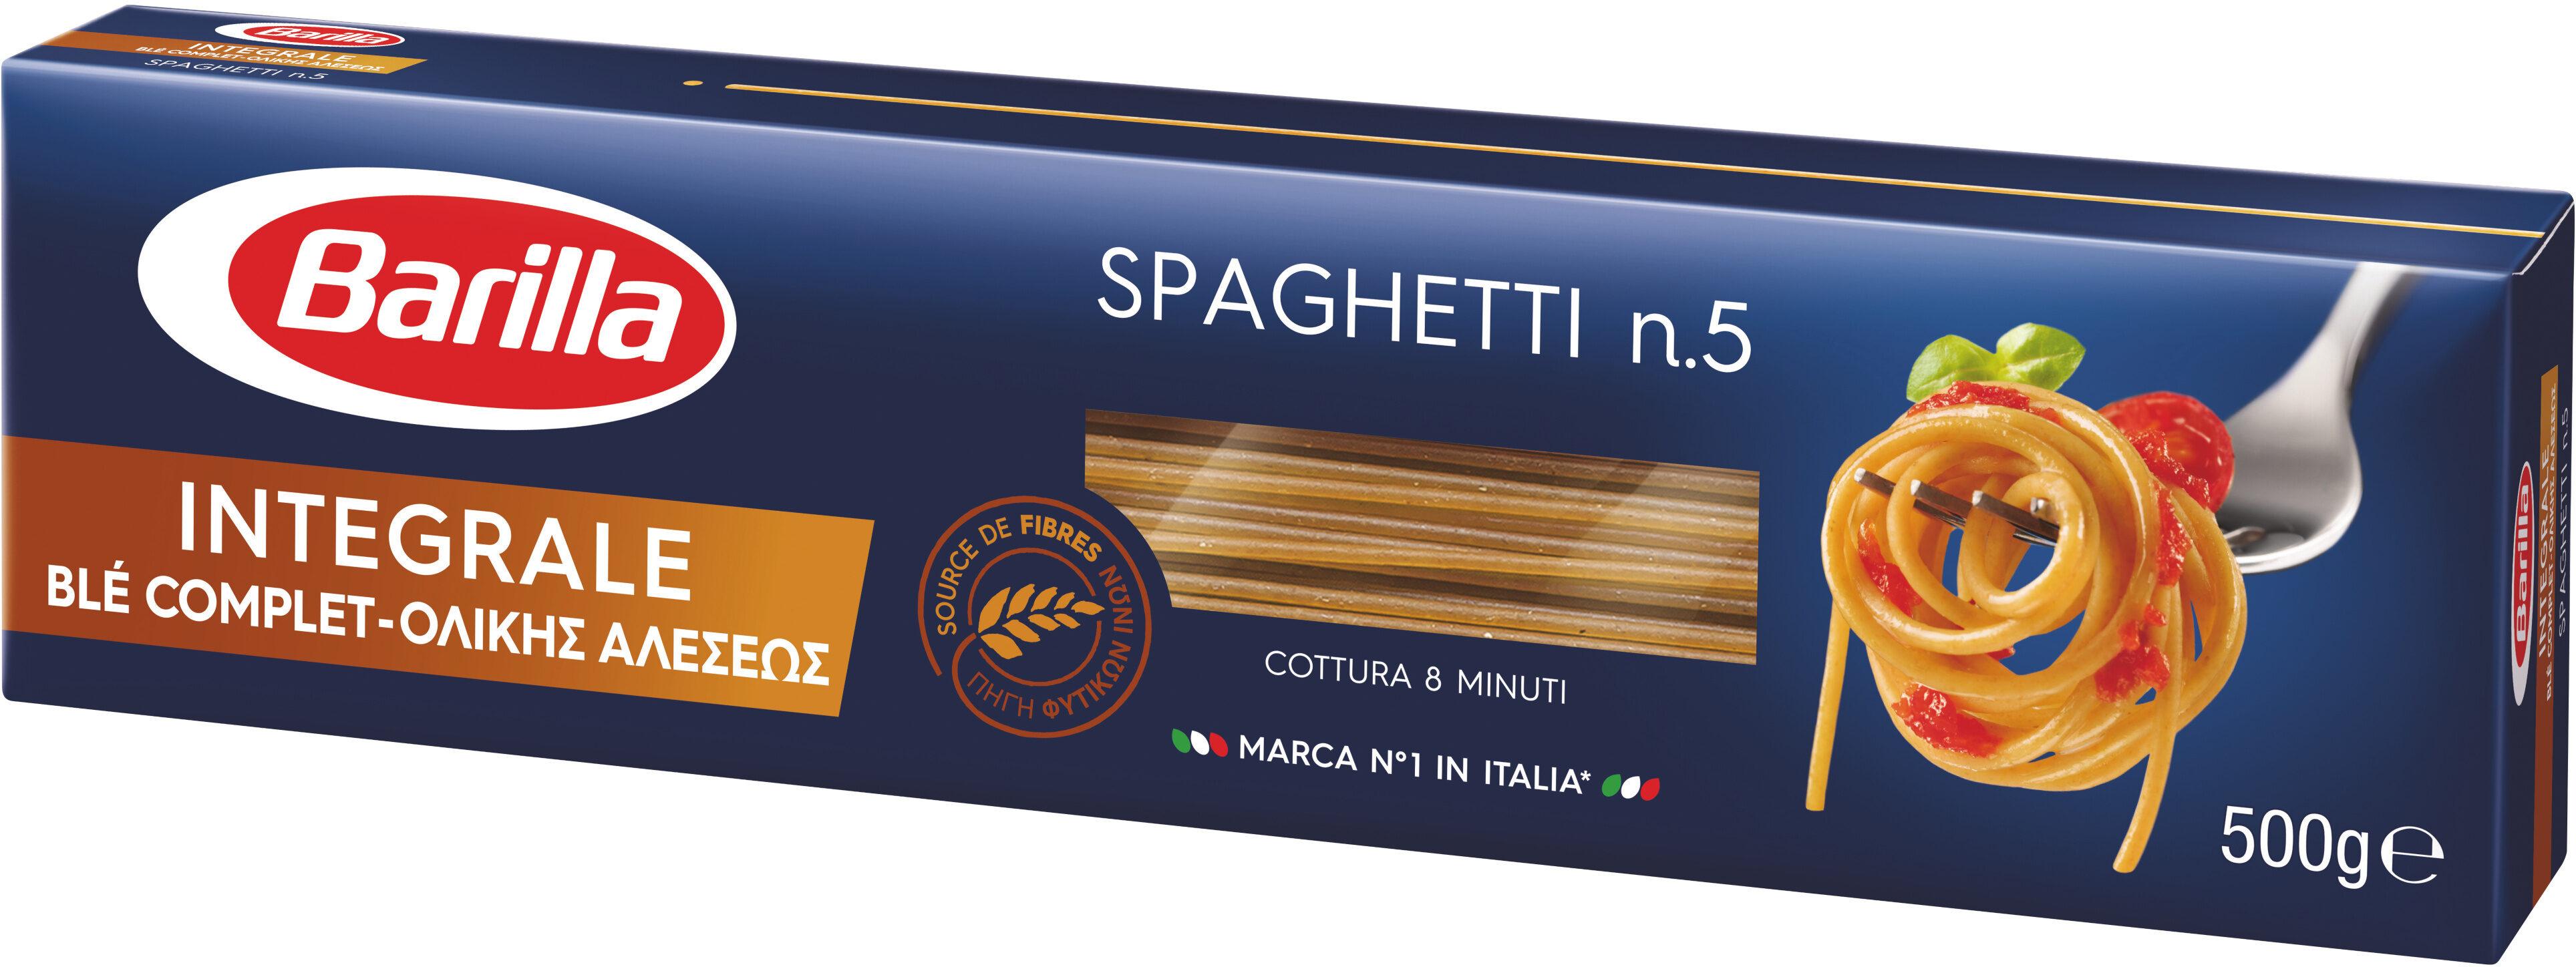 Barilla pates integrale spaghetti n°5 au ble complet - Product - fr